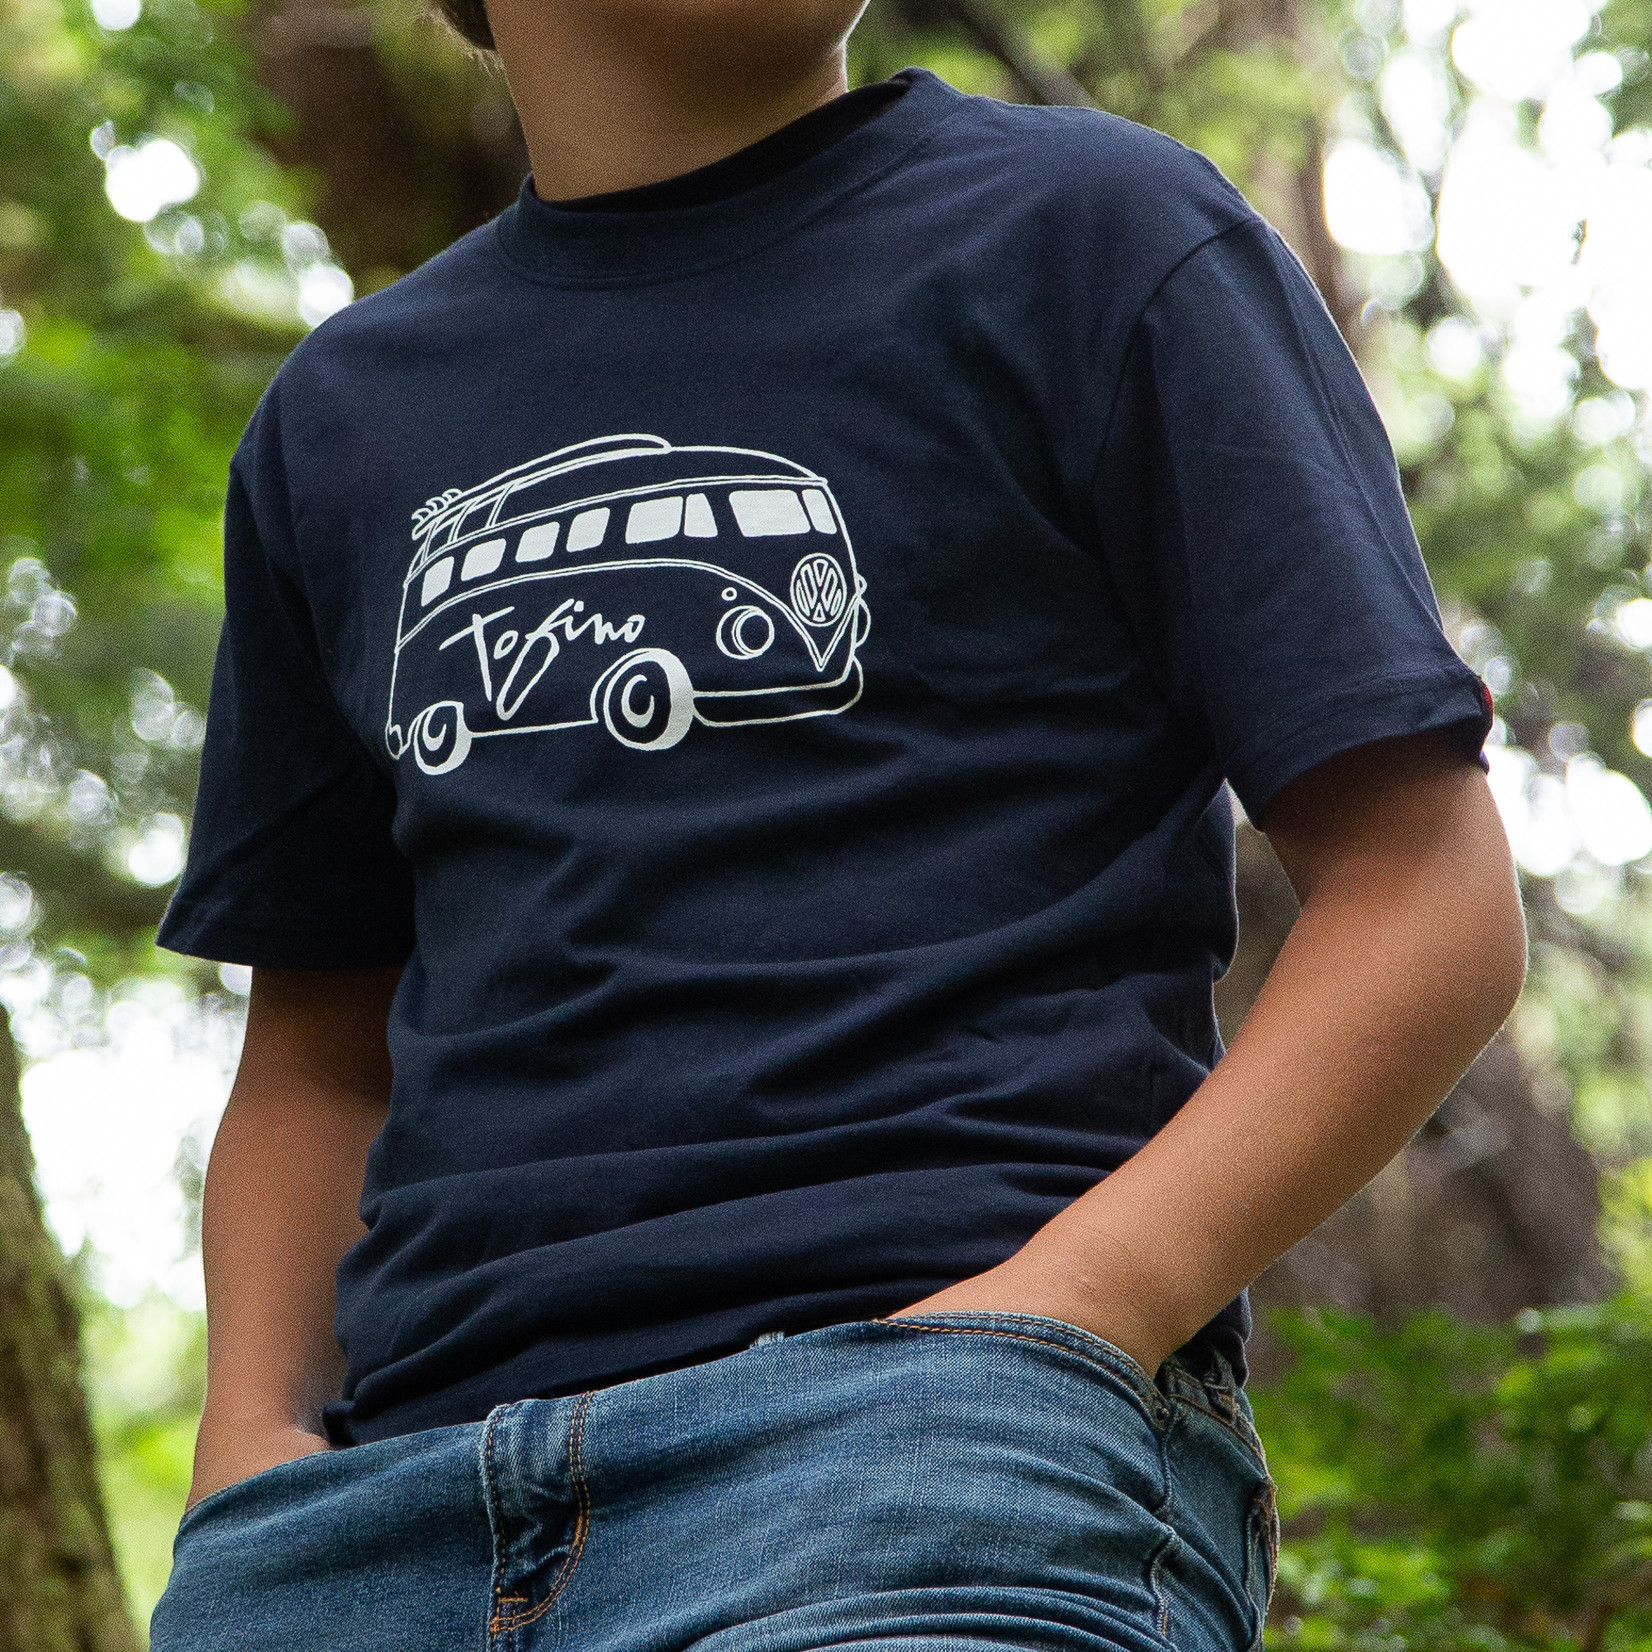 Tourism Tofino T-Shirt Toddler Chestervan